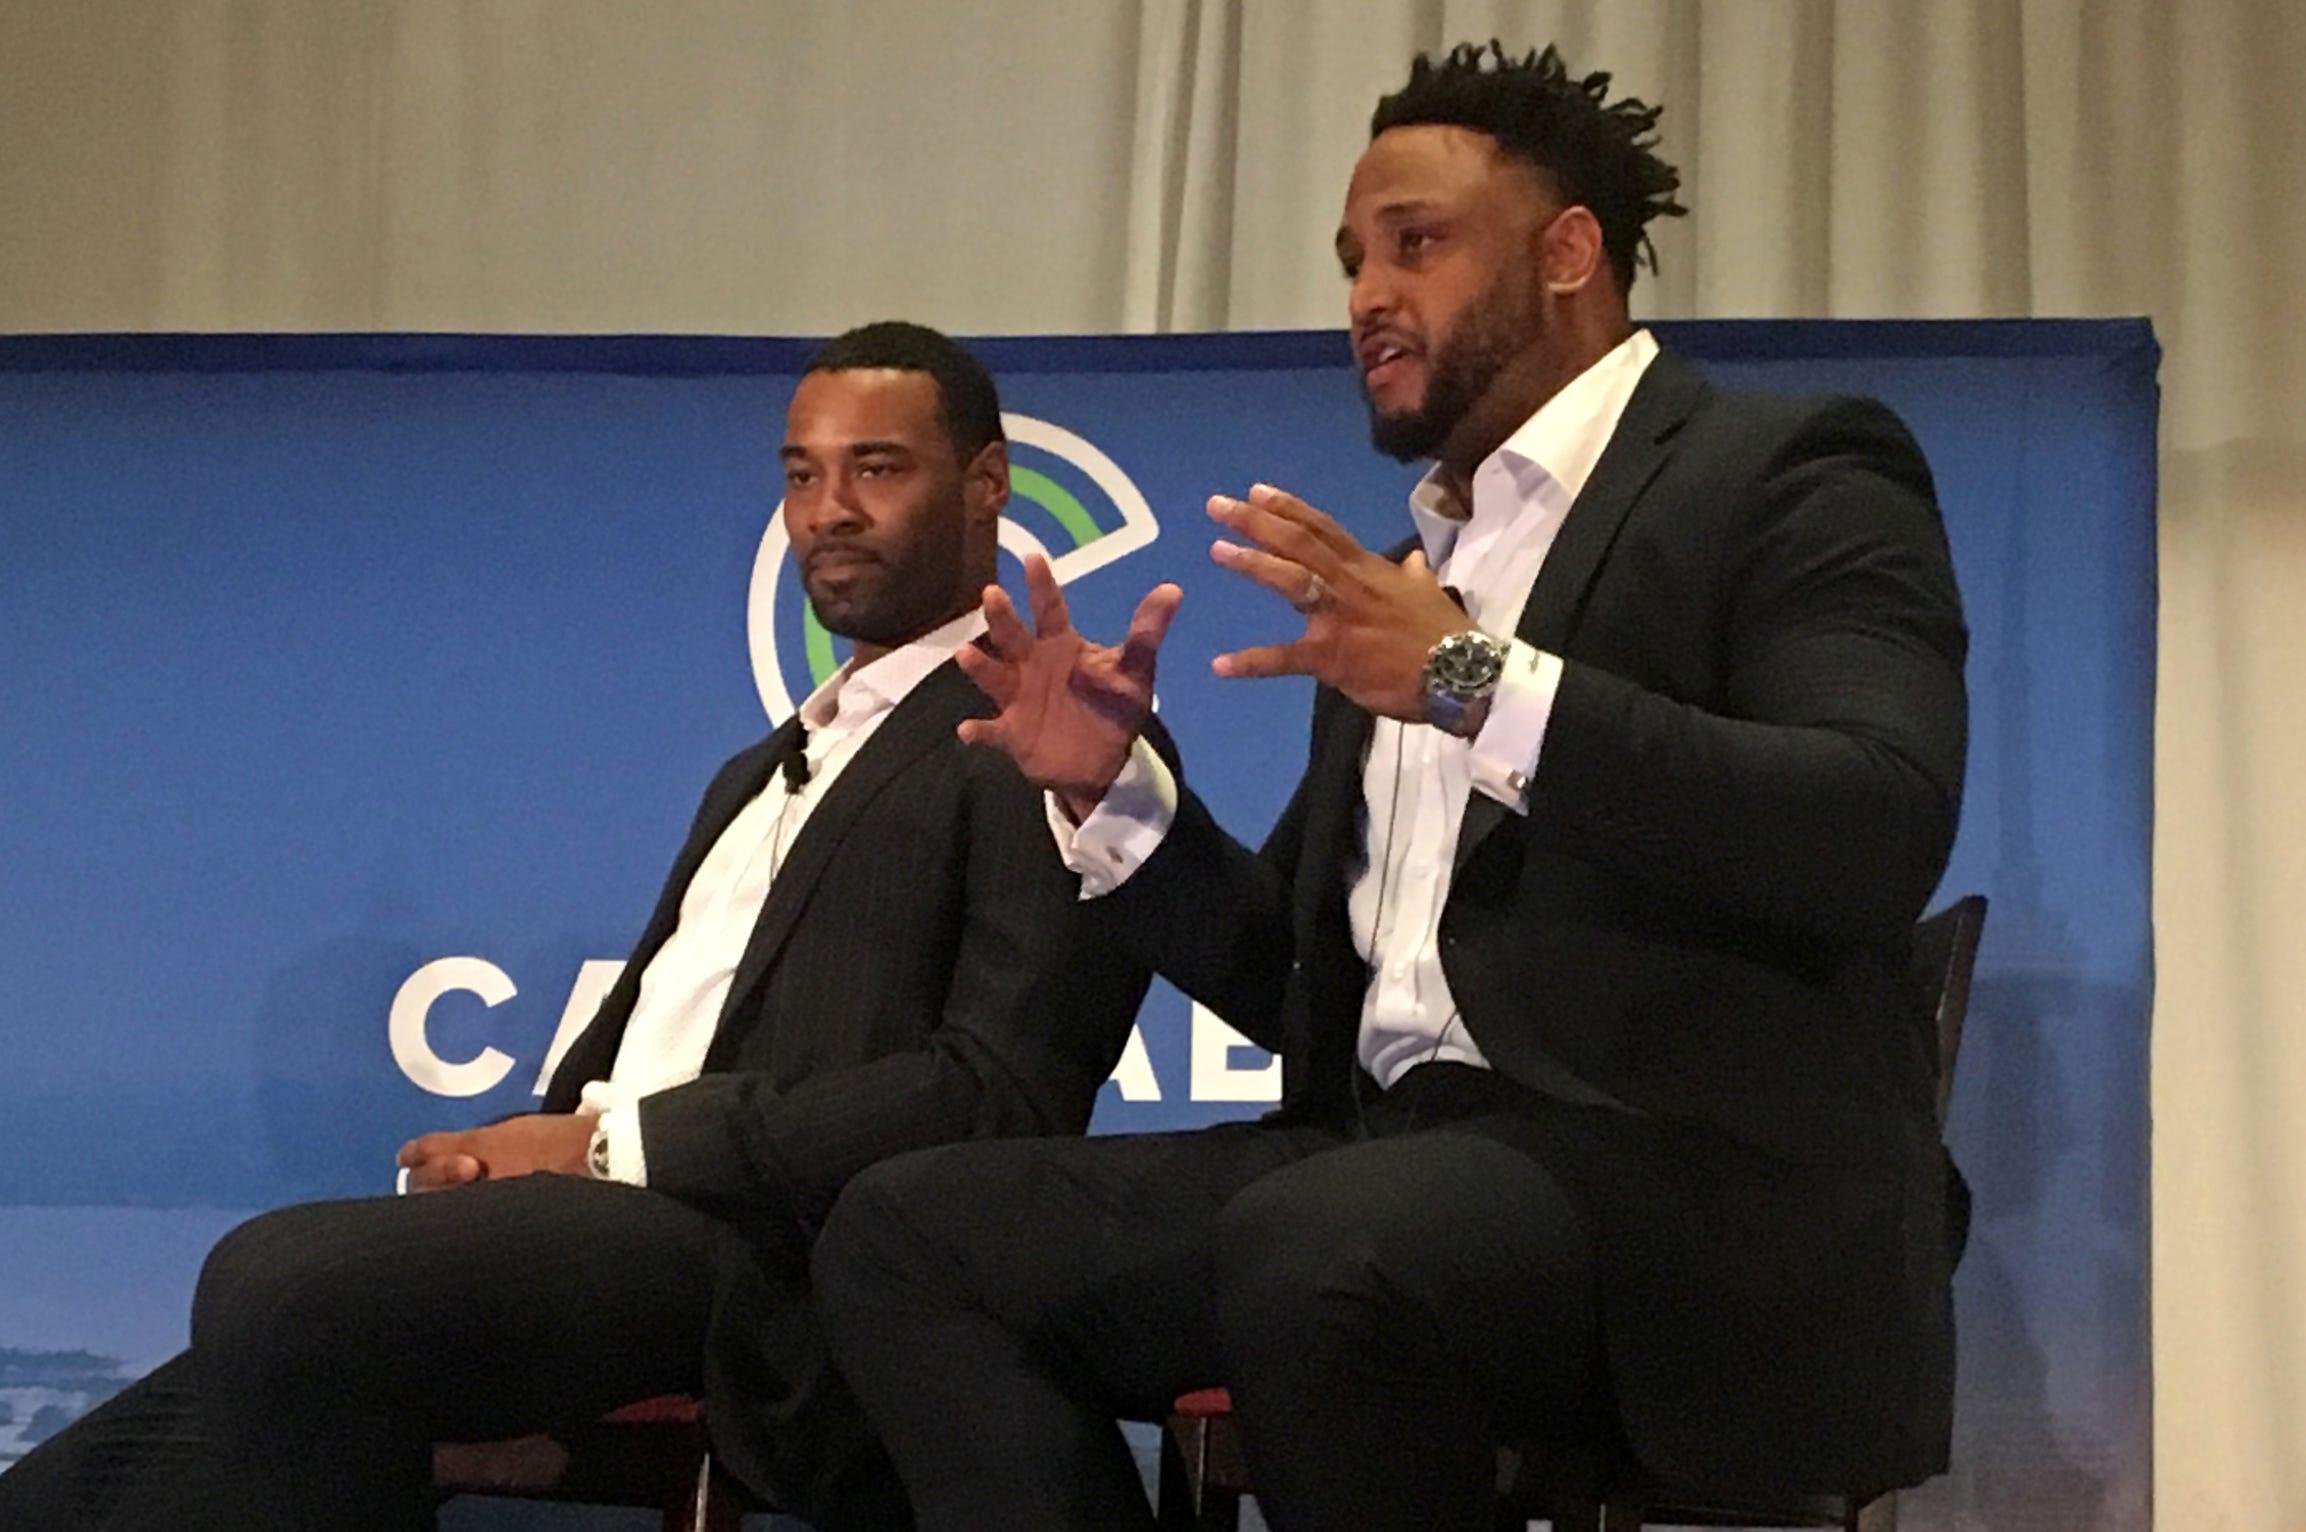 Ex-Lions star Calvin Johnson announces partnership with Harvard to study marijuana